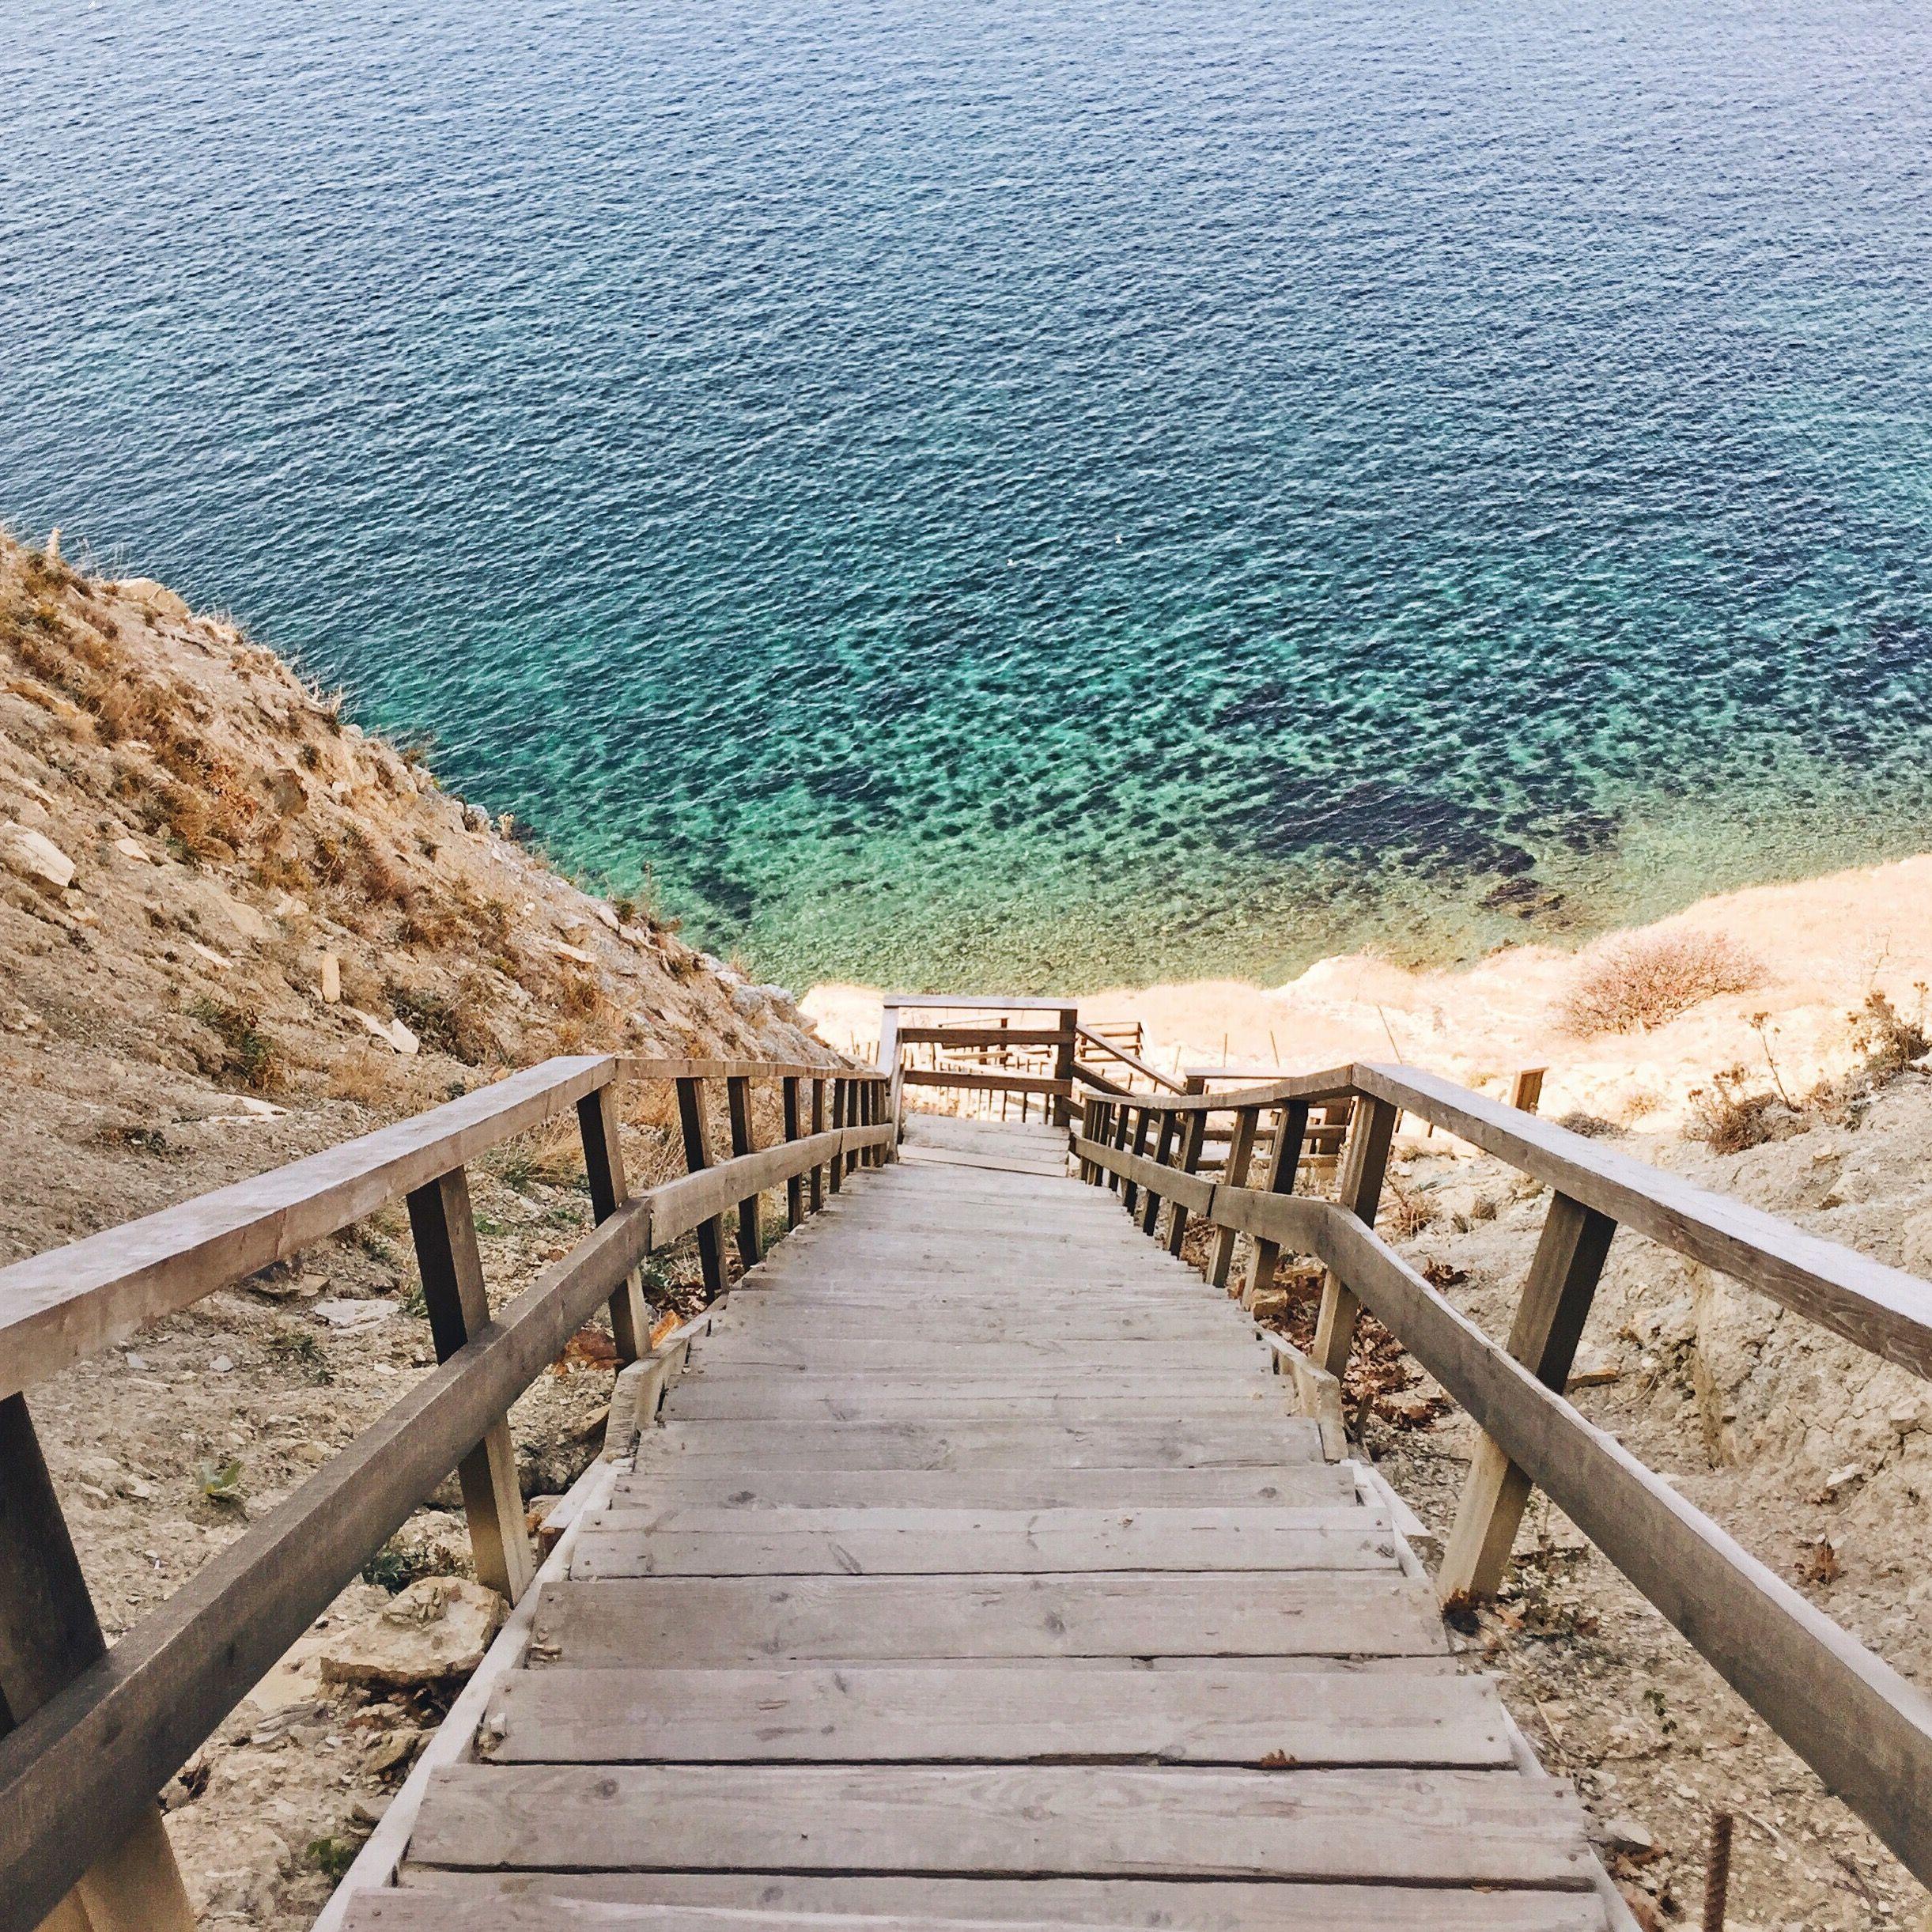 картинки лестницы к морю кляр